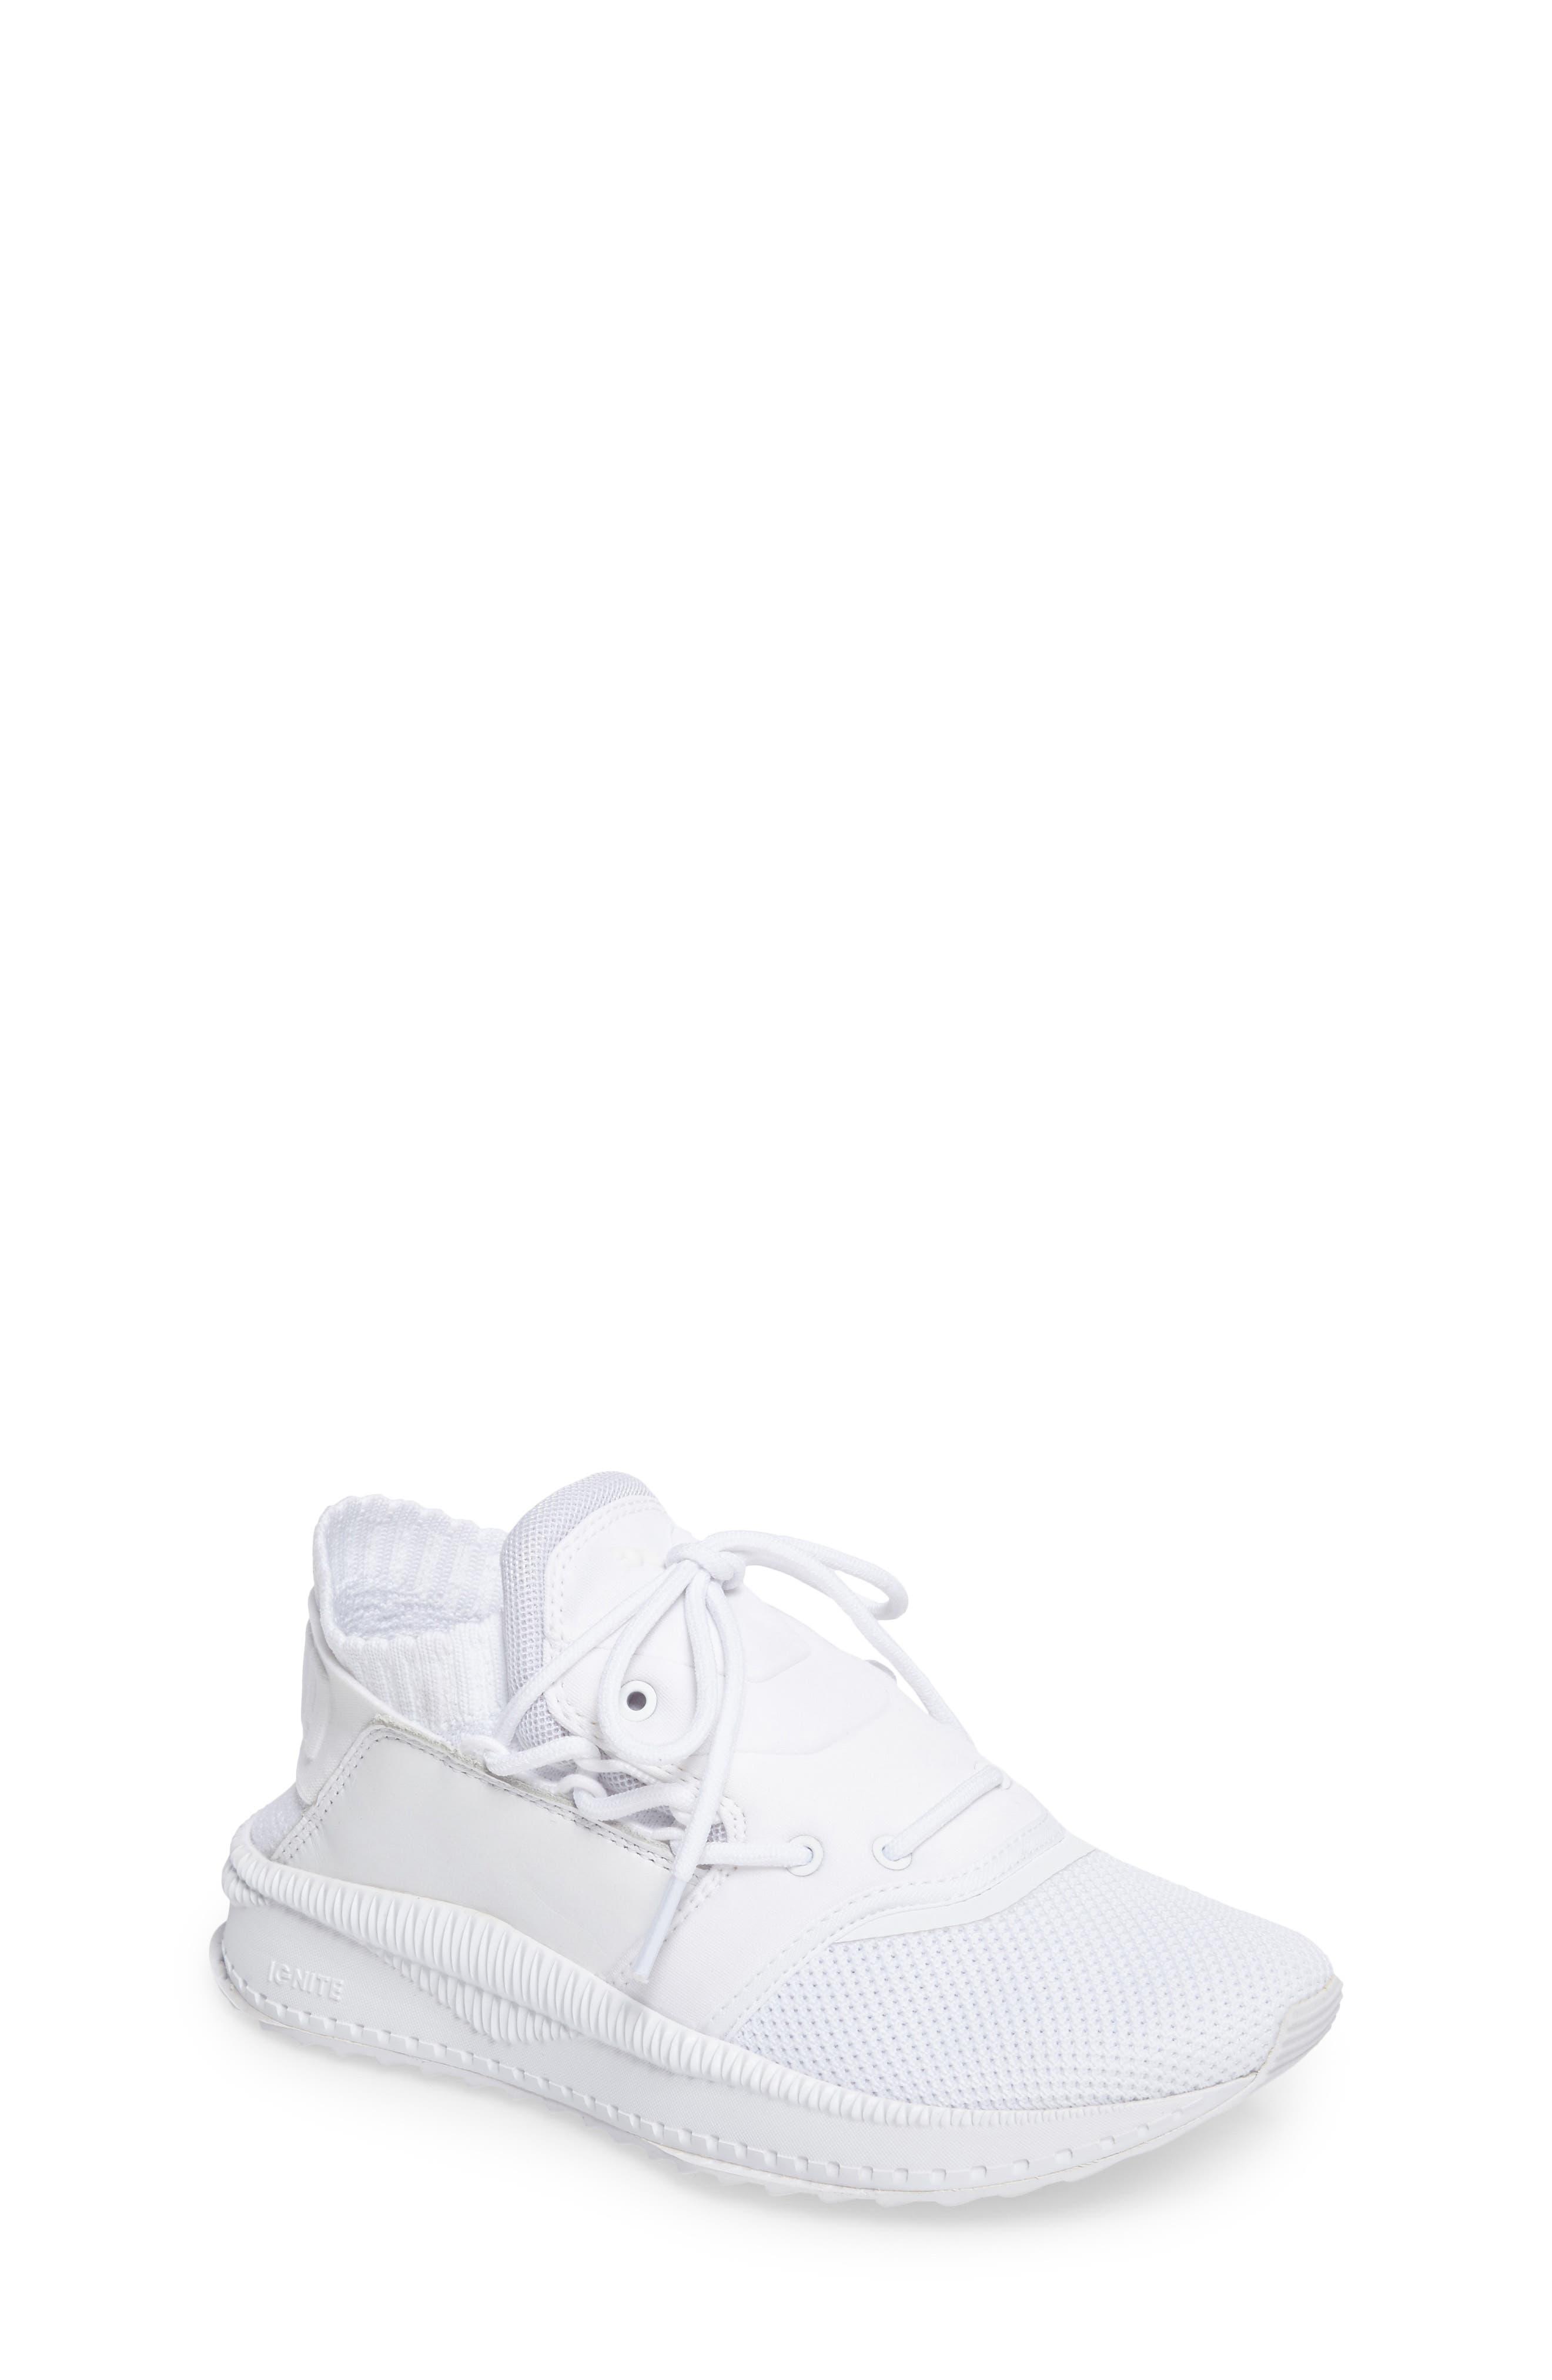 Tsugi Shinsei Jr Training Shoe,                         Main,                         color, White